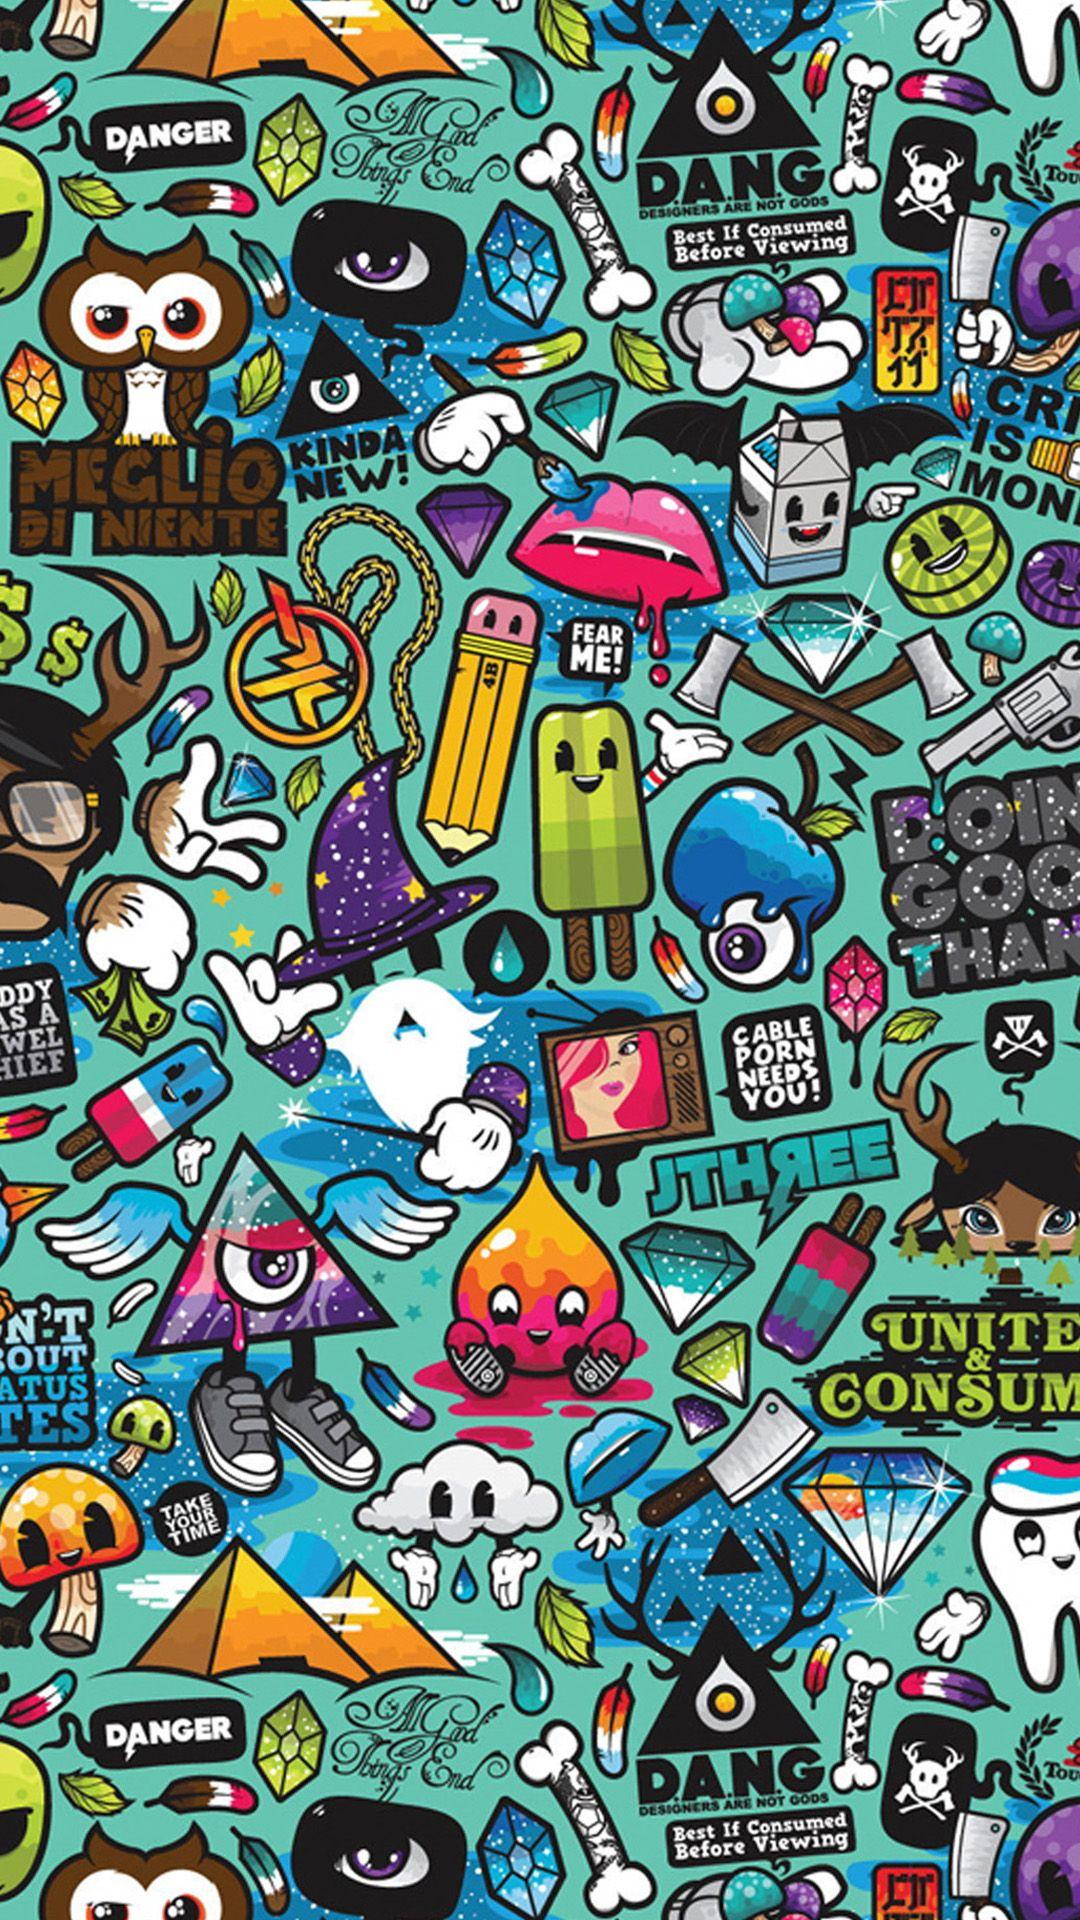 cool backgrounds - Google Search | Graffiti wallpaper ...